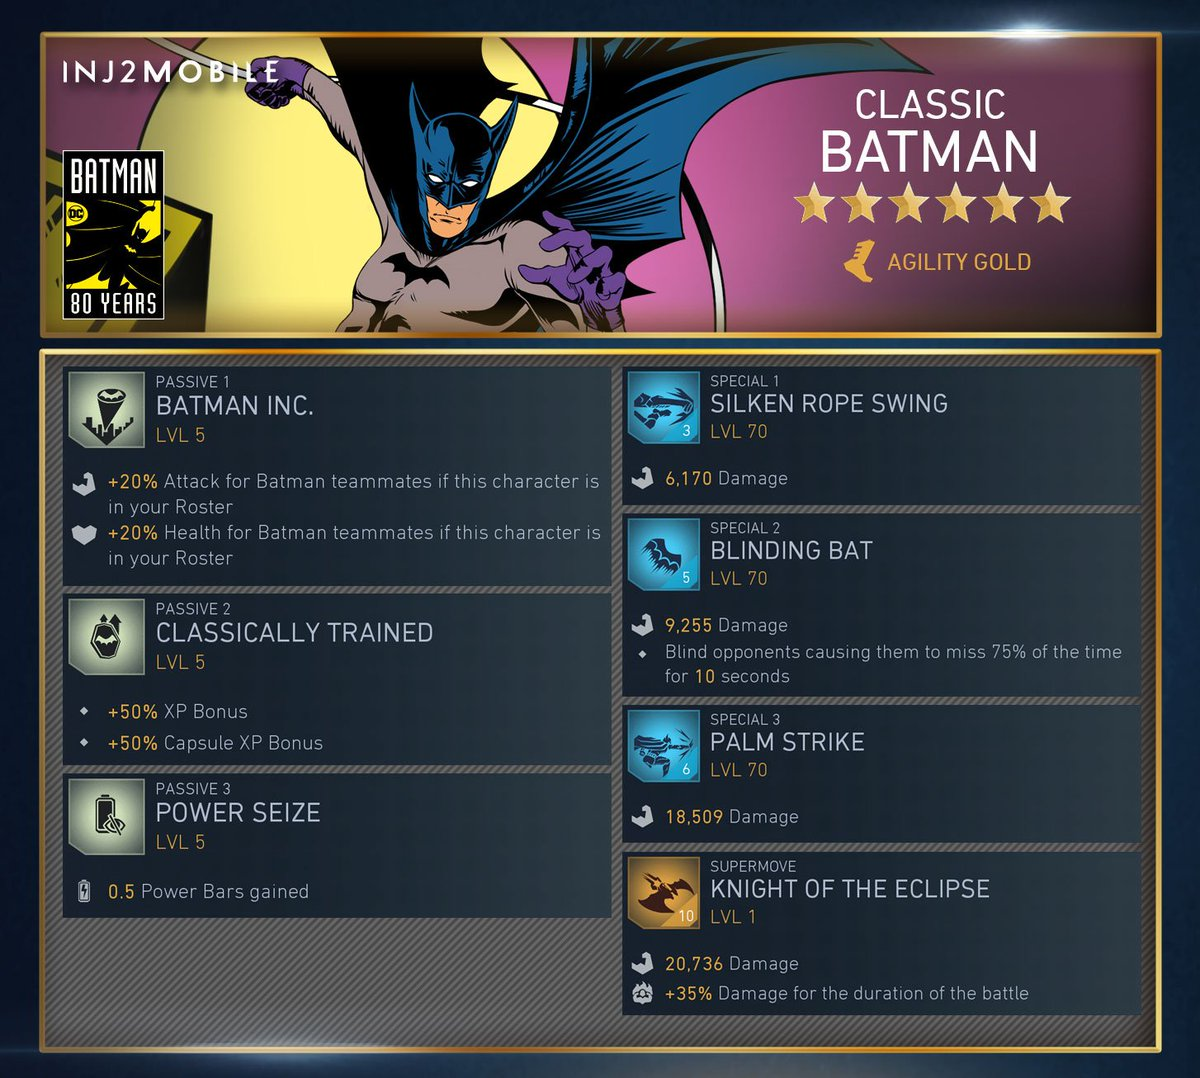 Classic Batman   Injustice 2 Mobile Wiki   FANDOM powered by